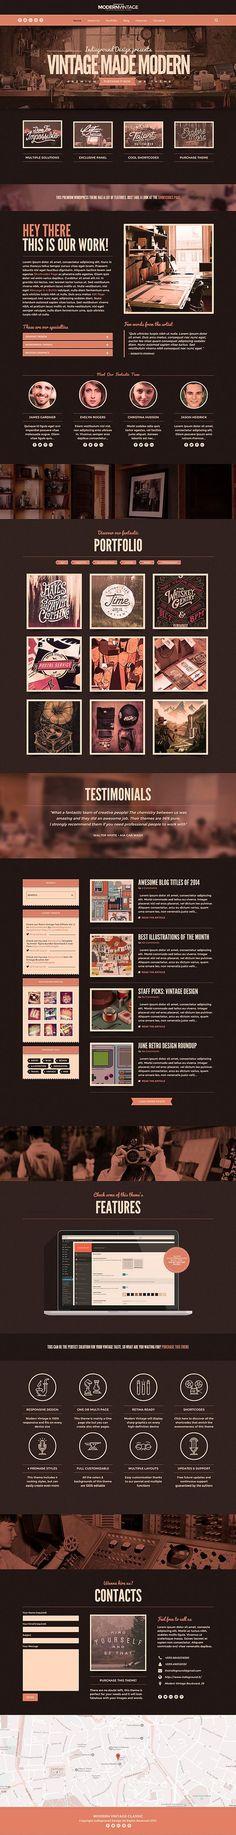 Modern Vintage Web Design | Fivestar Branding – Design and Branding Agency & Inspiration Gallery